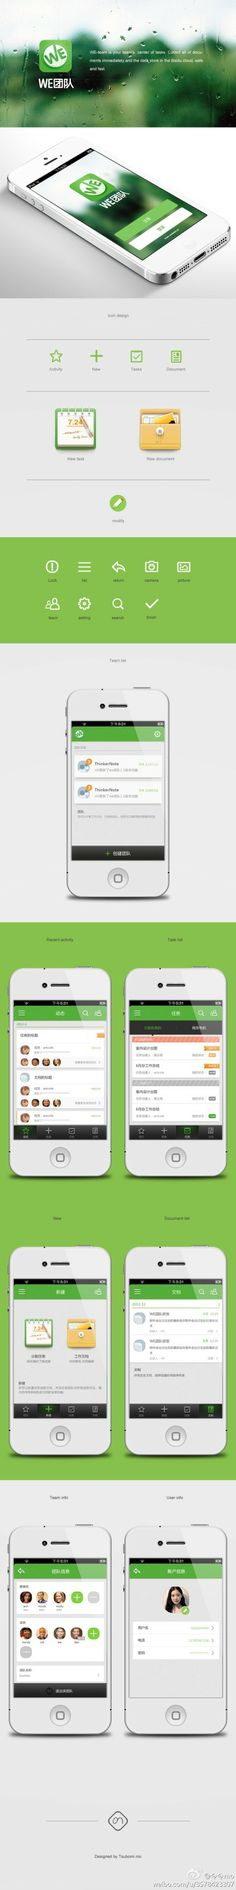 WE #UserInterface #UI #Design #Mobile #App